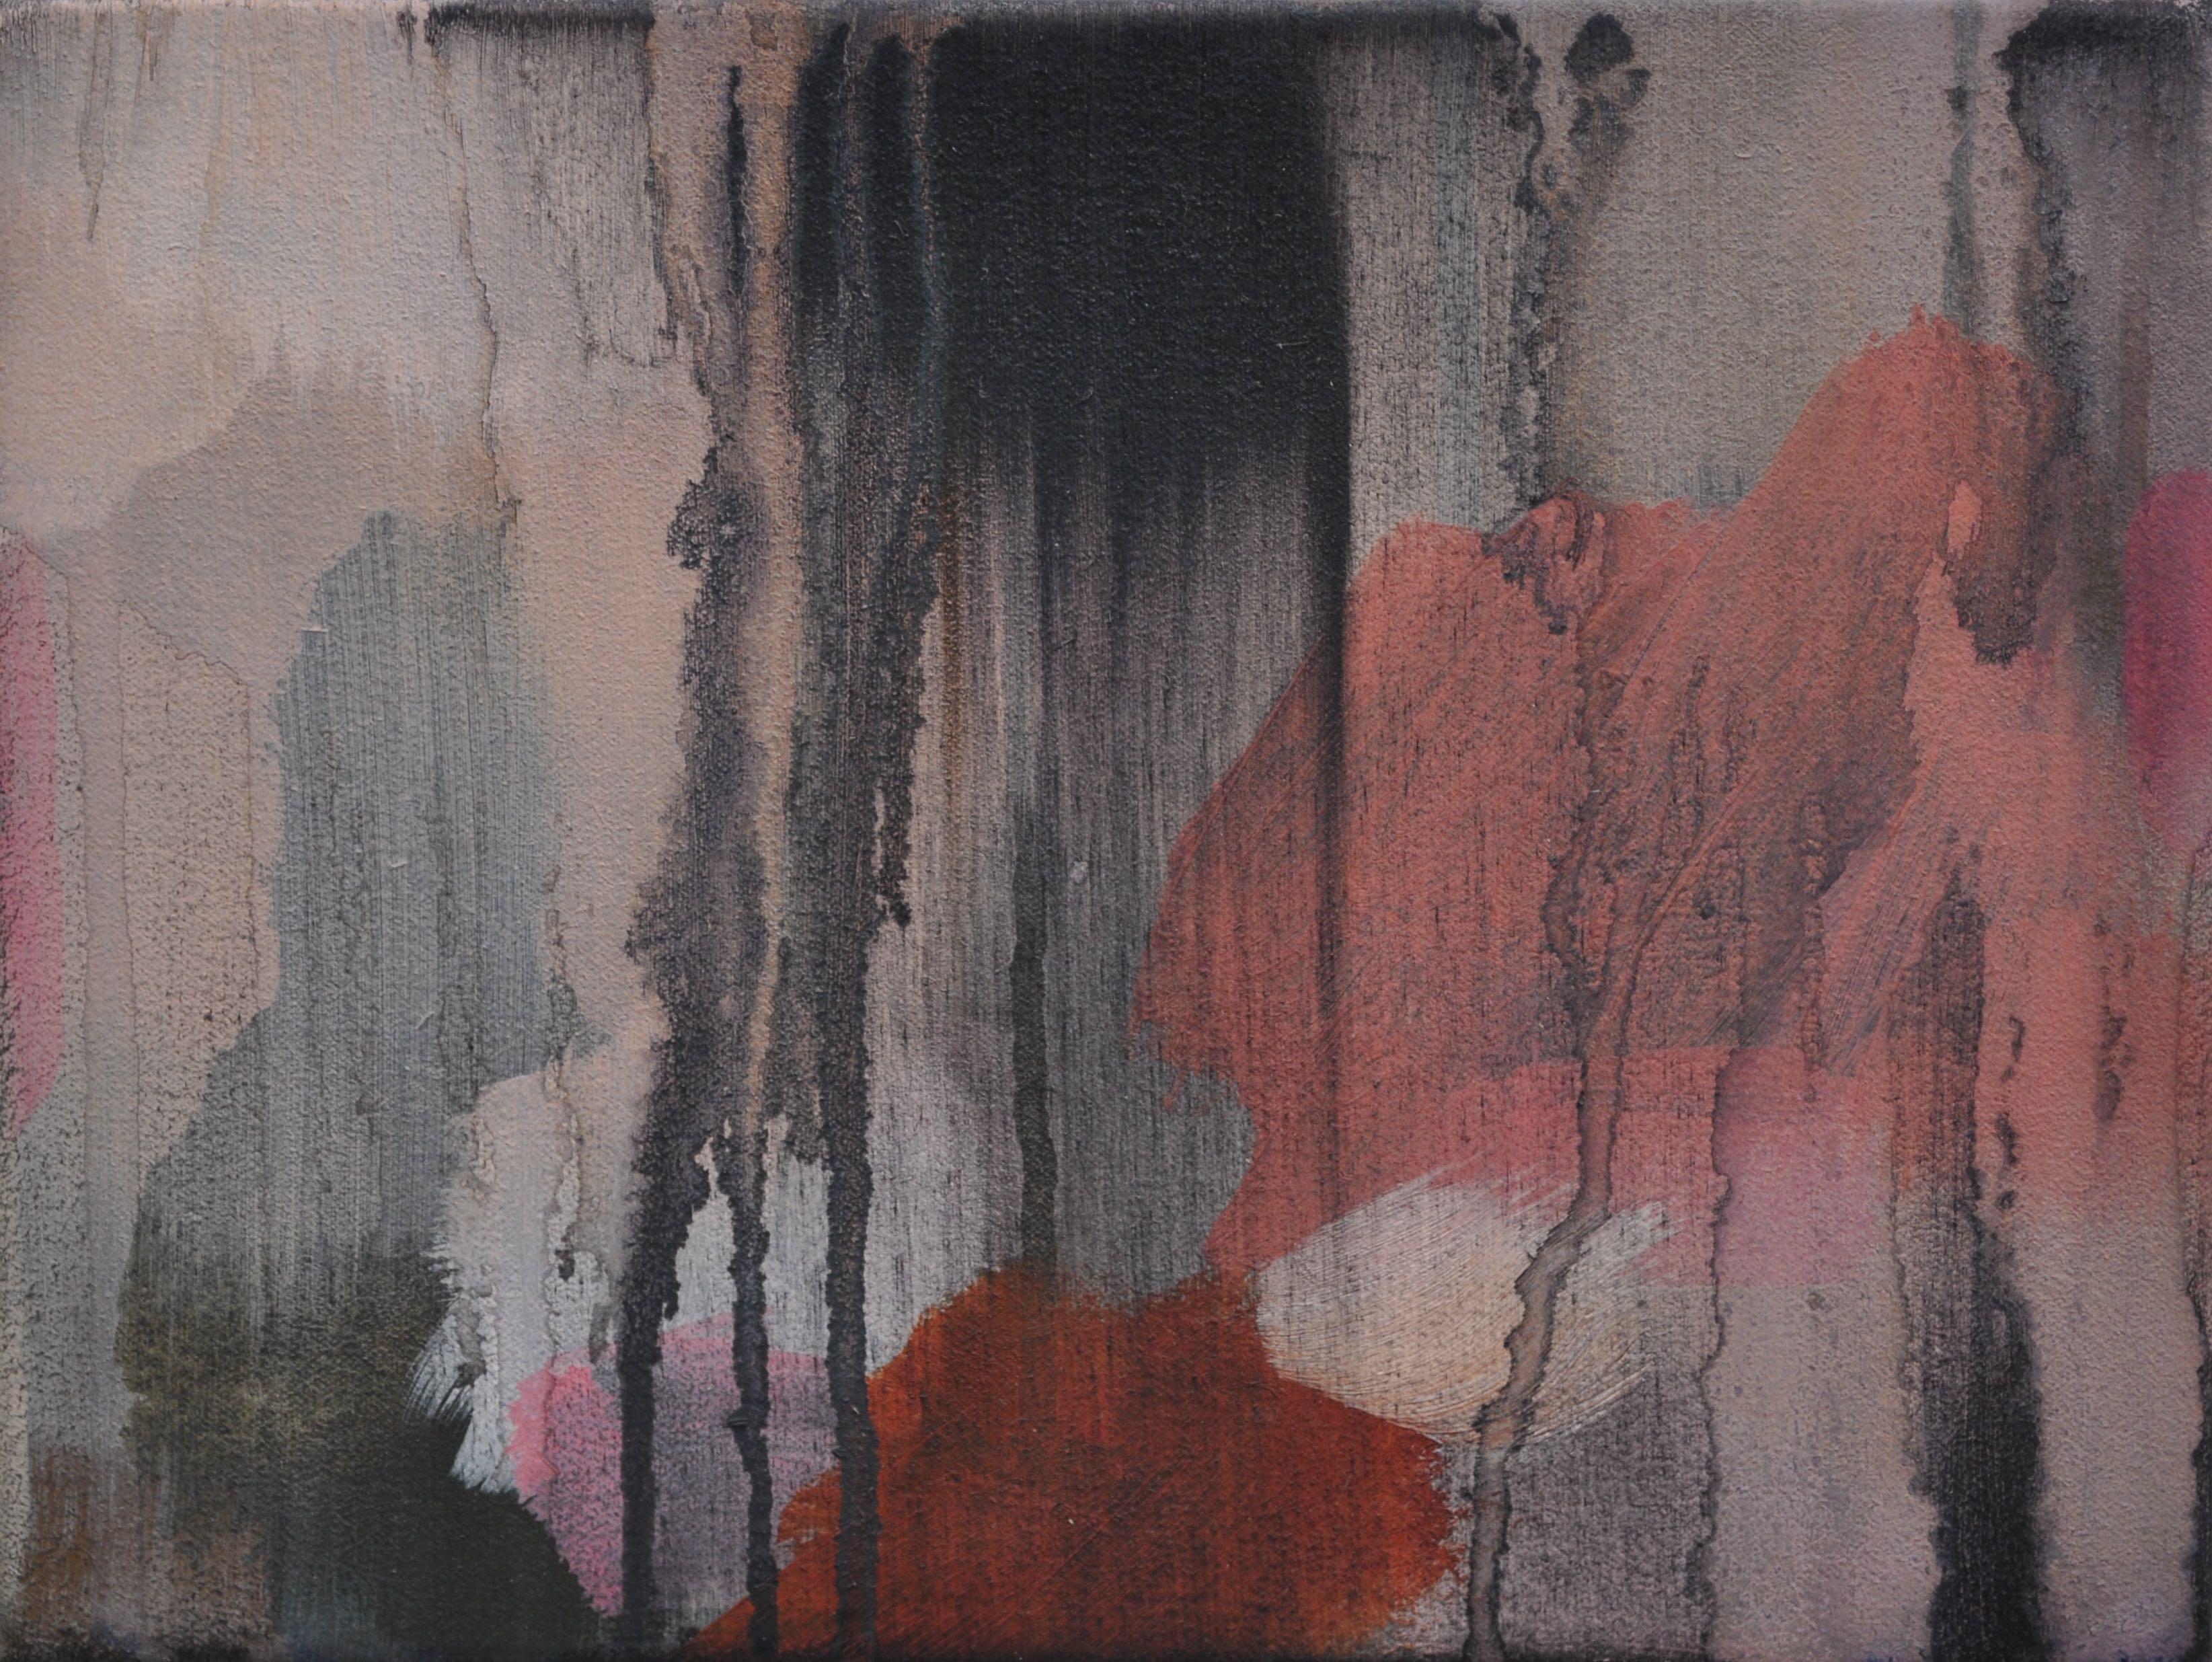 Endless Conversations 04 15x20x8cm Oil on Canvas 2015.jpg